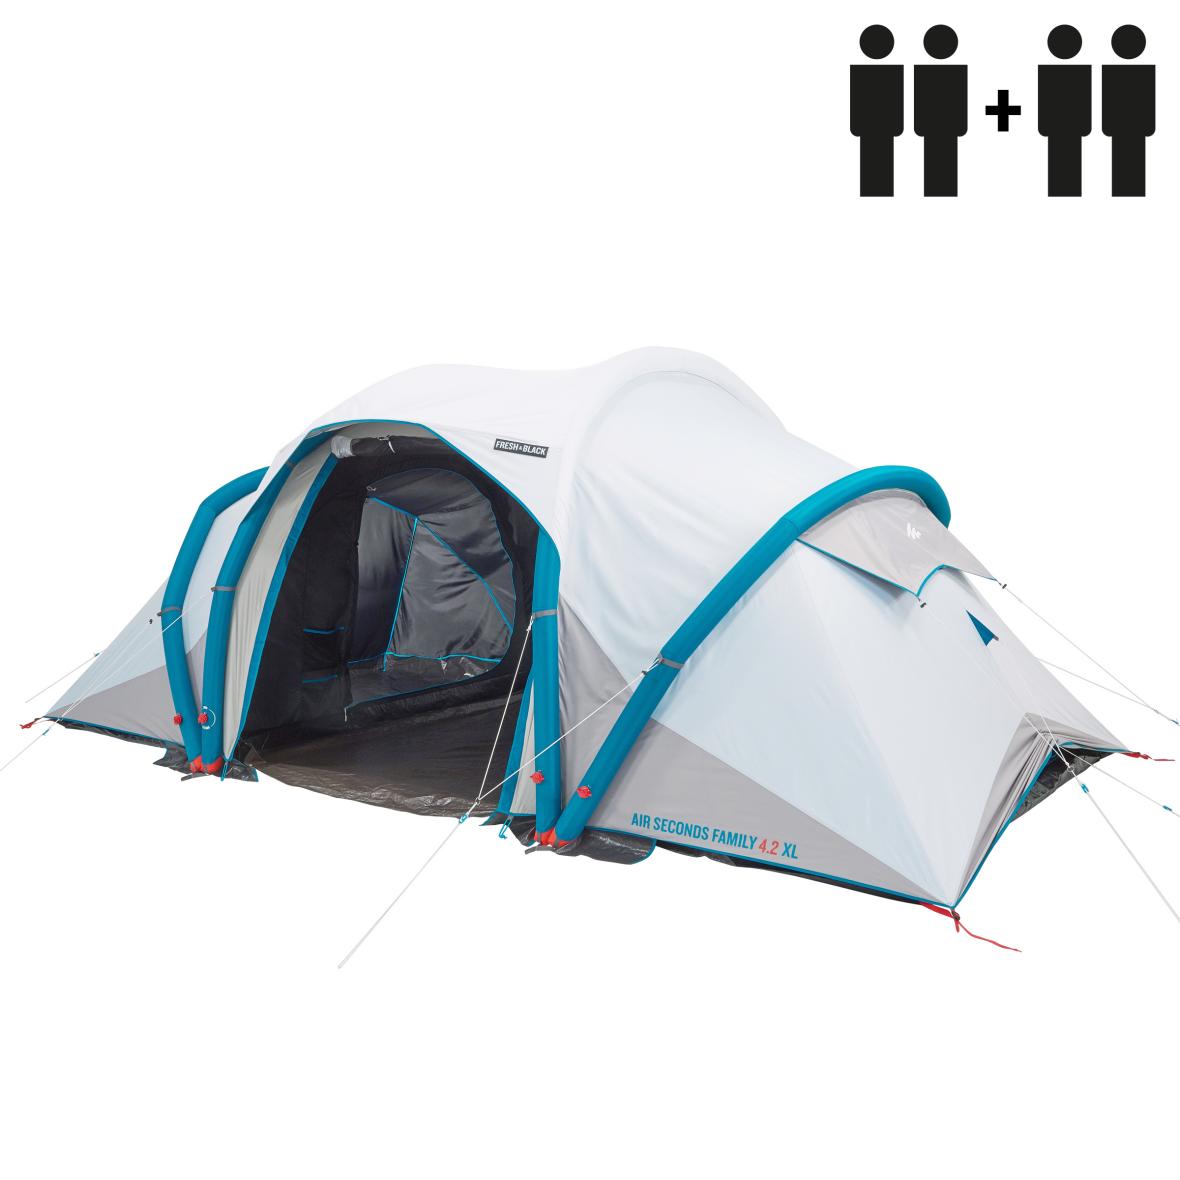 herstellen-tent-arpenaz-2-personen-quechua-beschadigd